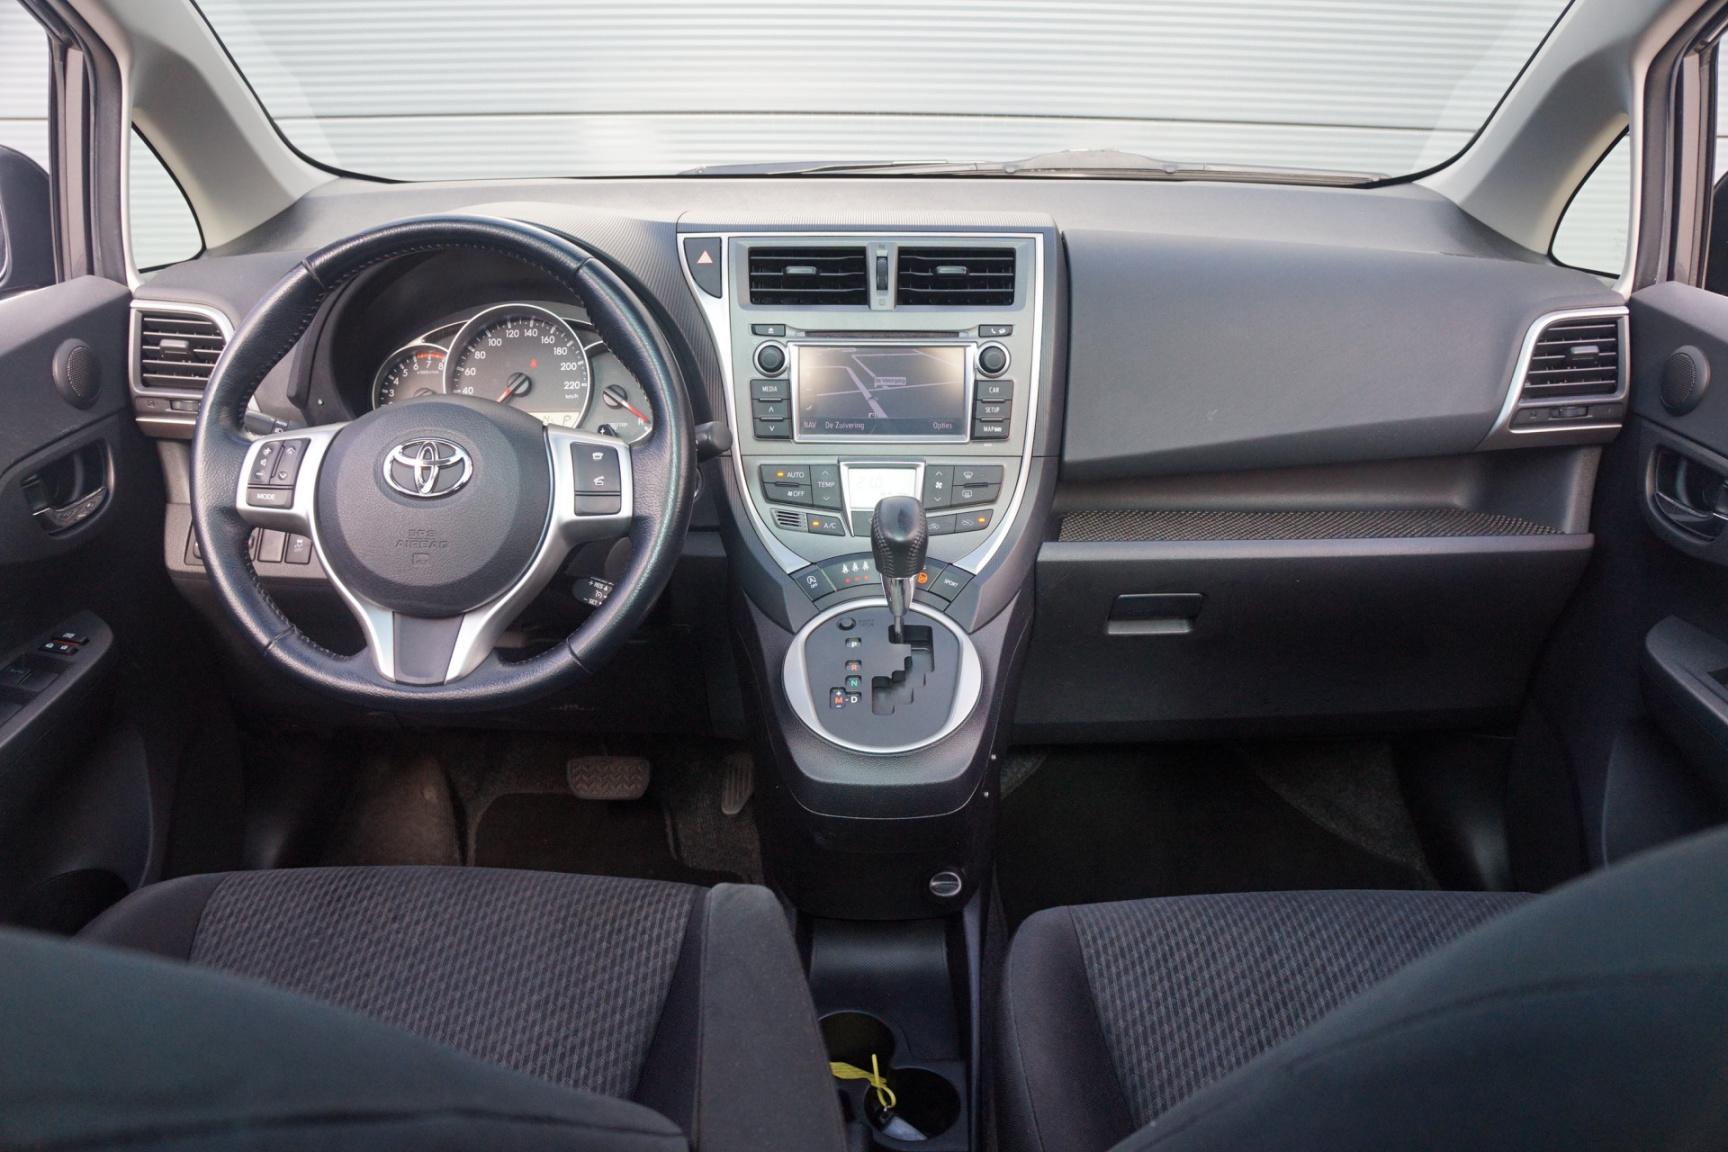 Toyota-Verso-S-12